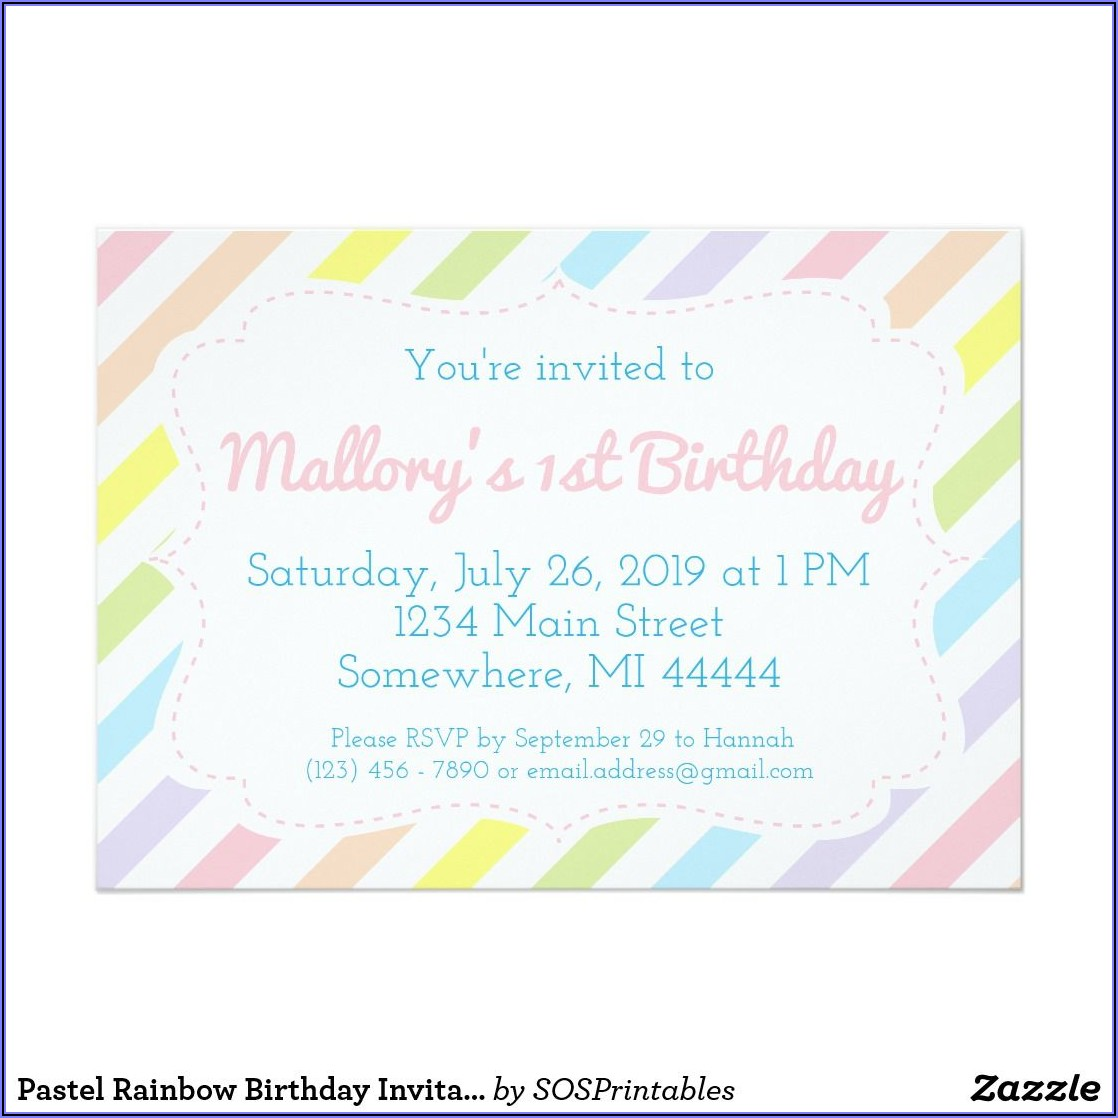 Pastel Rainbow Birthday Invitations